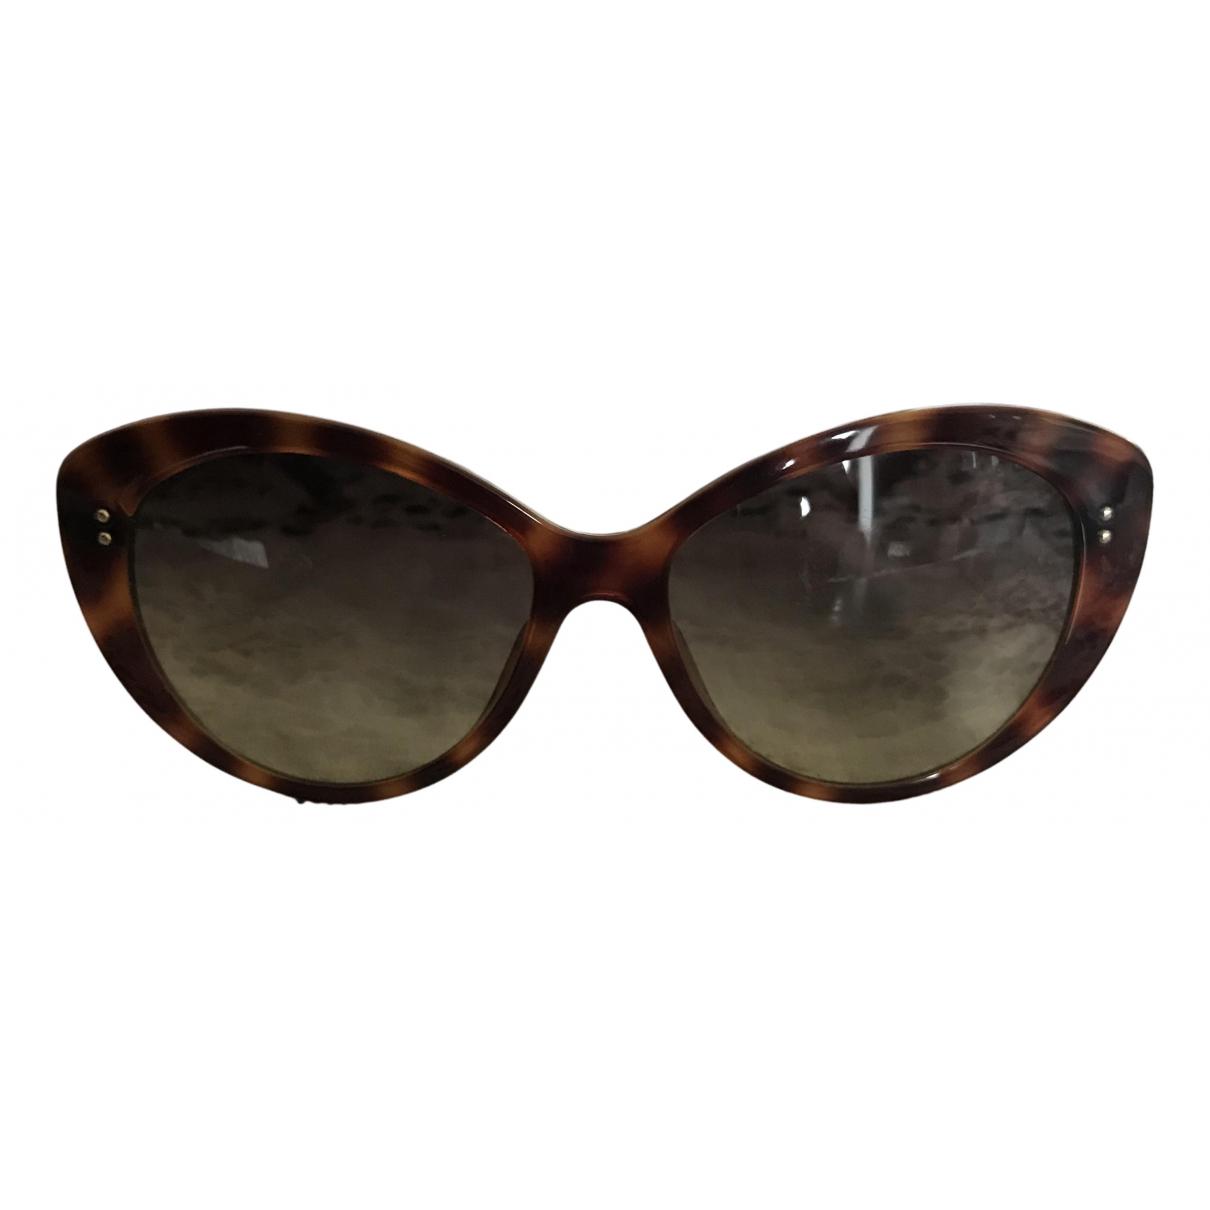 Tommy Hilfiger N Brown Sunglasses for Women N